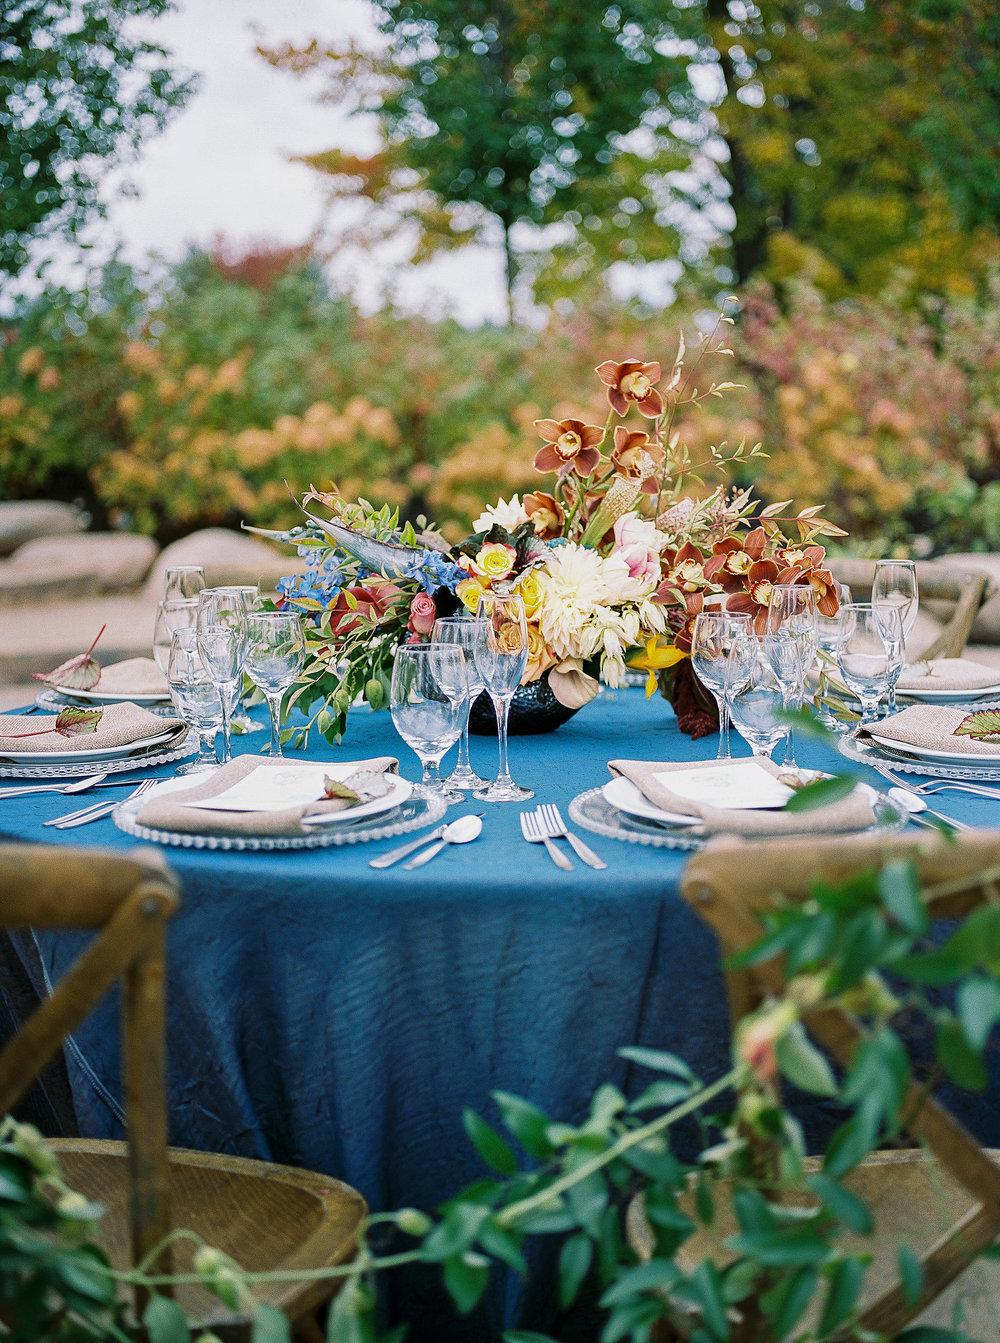 Alexandra-Elise-Photography-Ali-Reed-Film-Wedding-Photographer-Deerfield-Country-Club-002.jpg